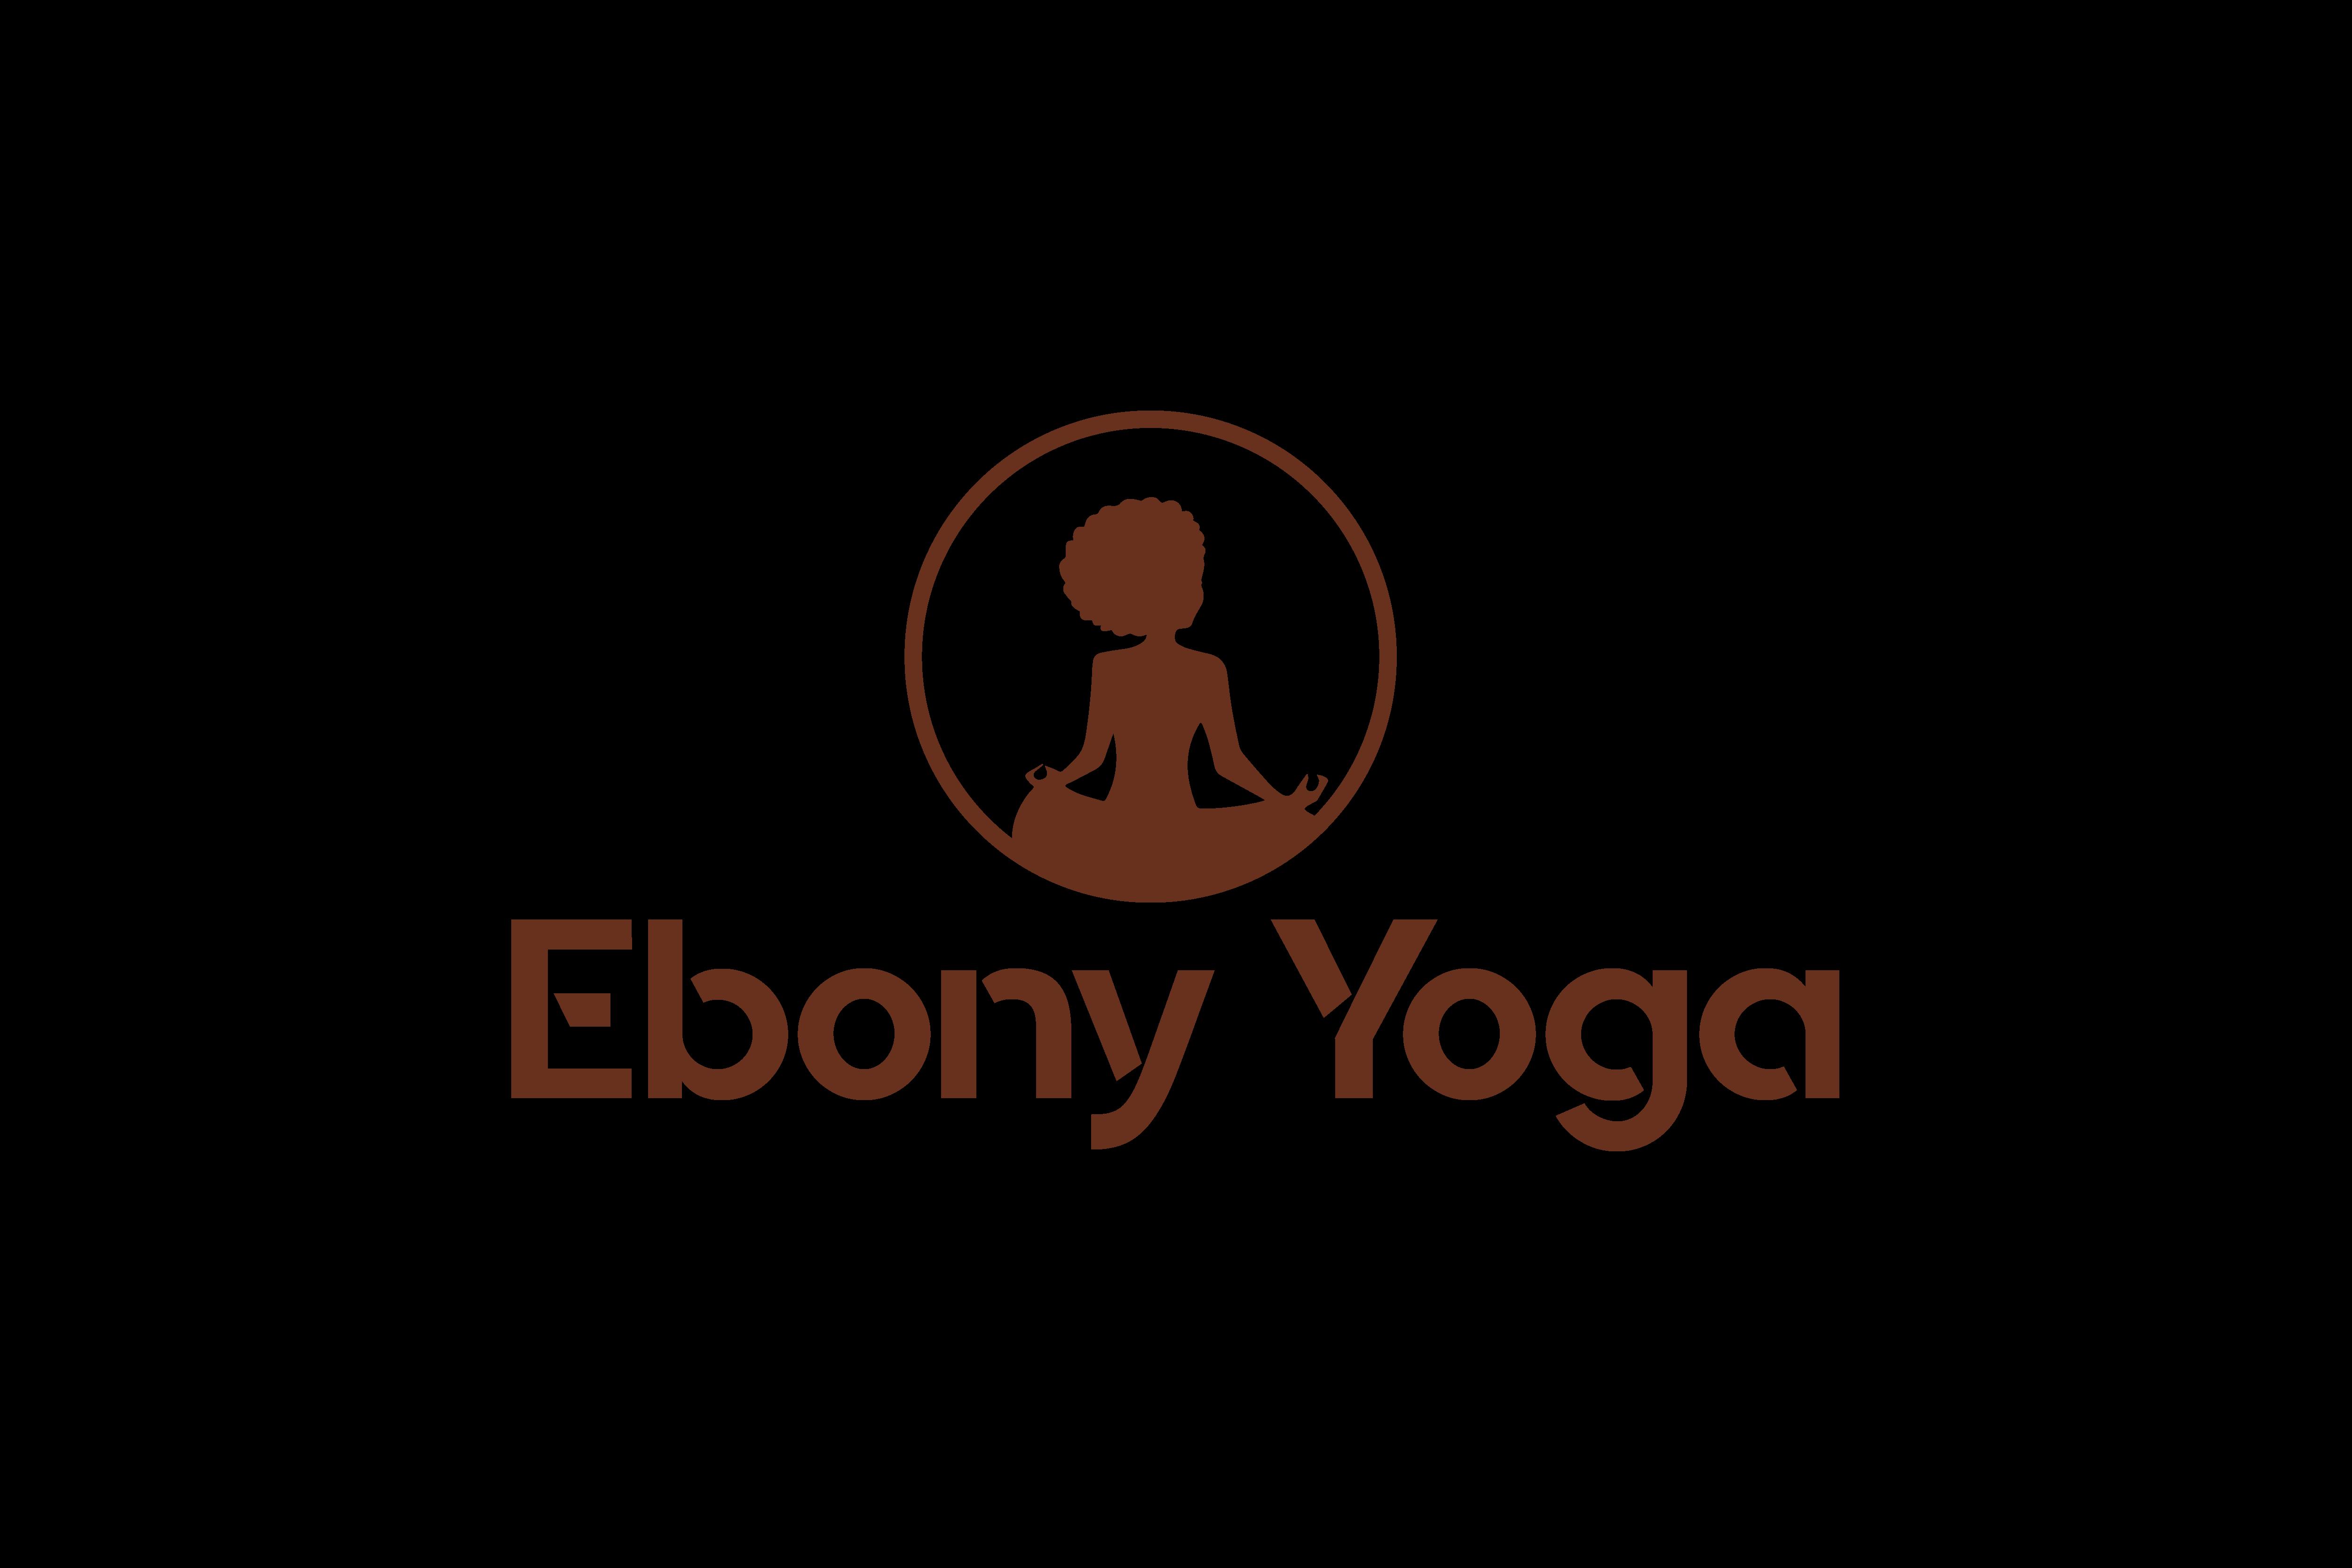 Ebony Yoga